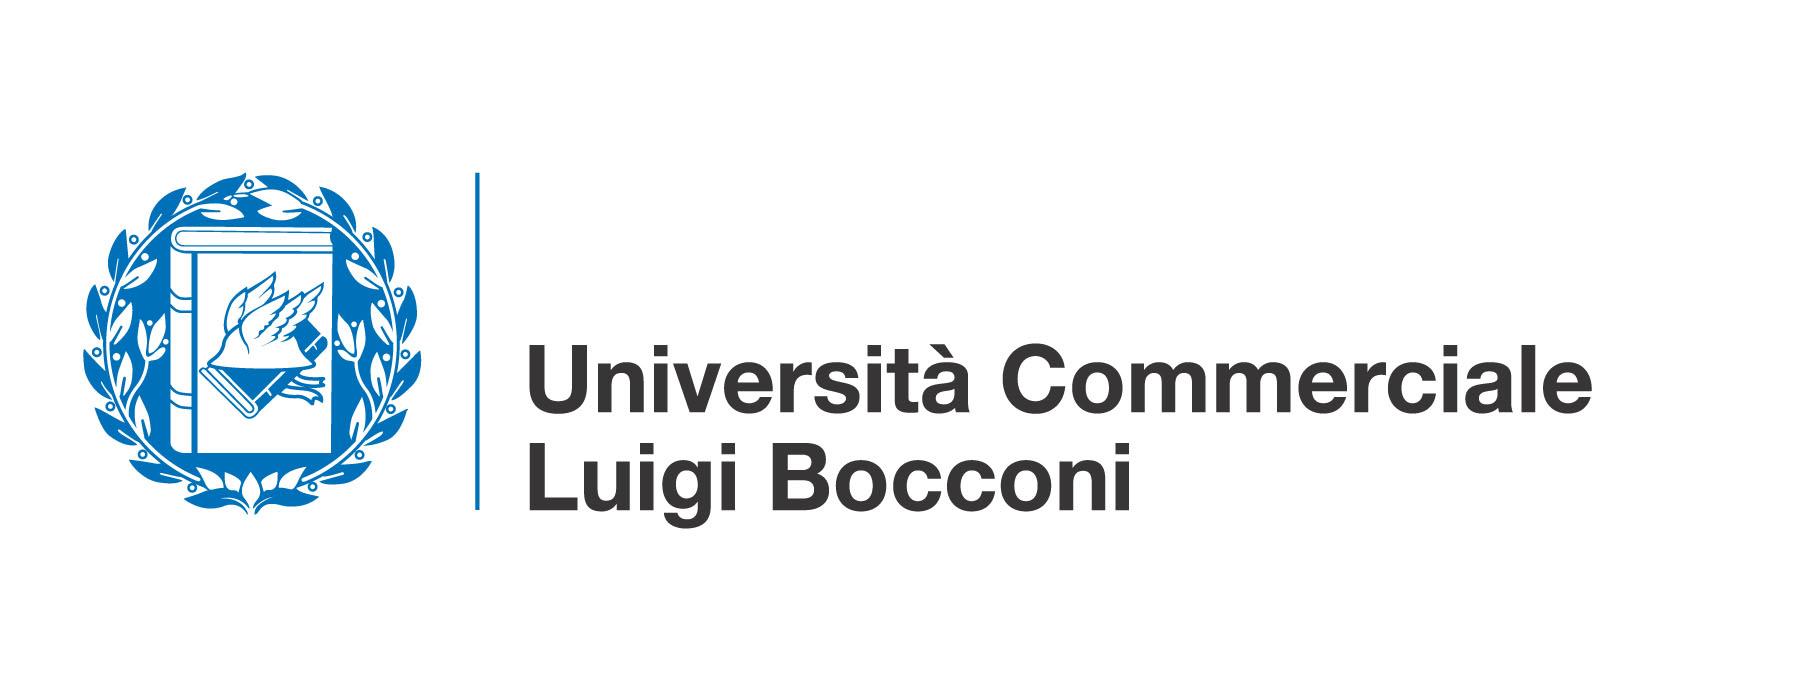 Bocconi.jpg